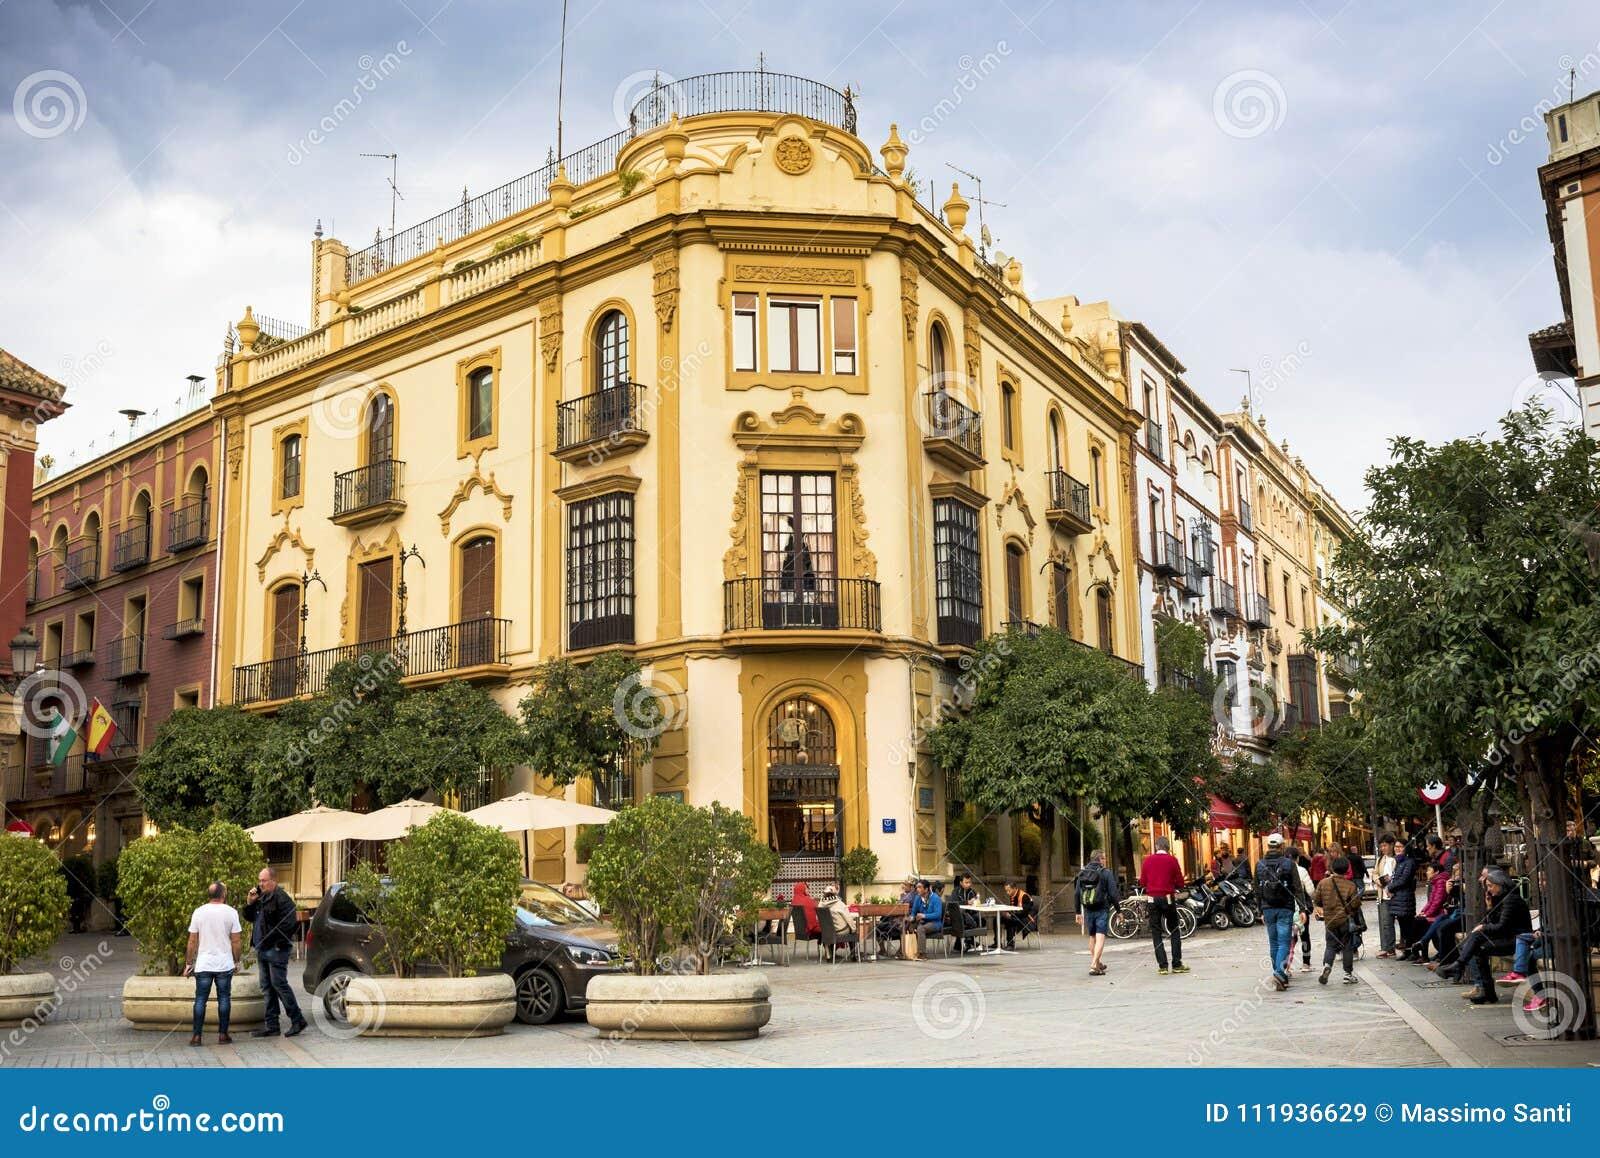 SEVILLE - SPAIN: FEBRUARY 27, 2018 - Plaza Virgen de los Reyes. Spain.